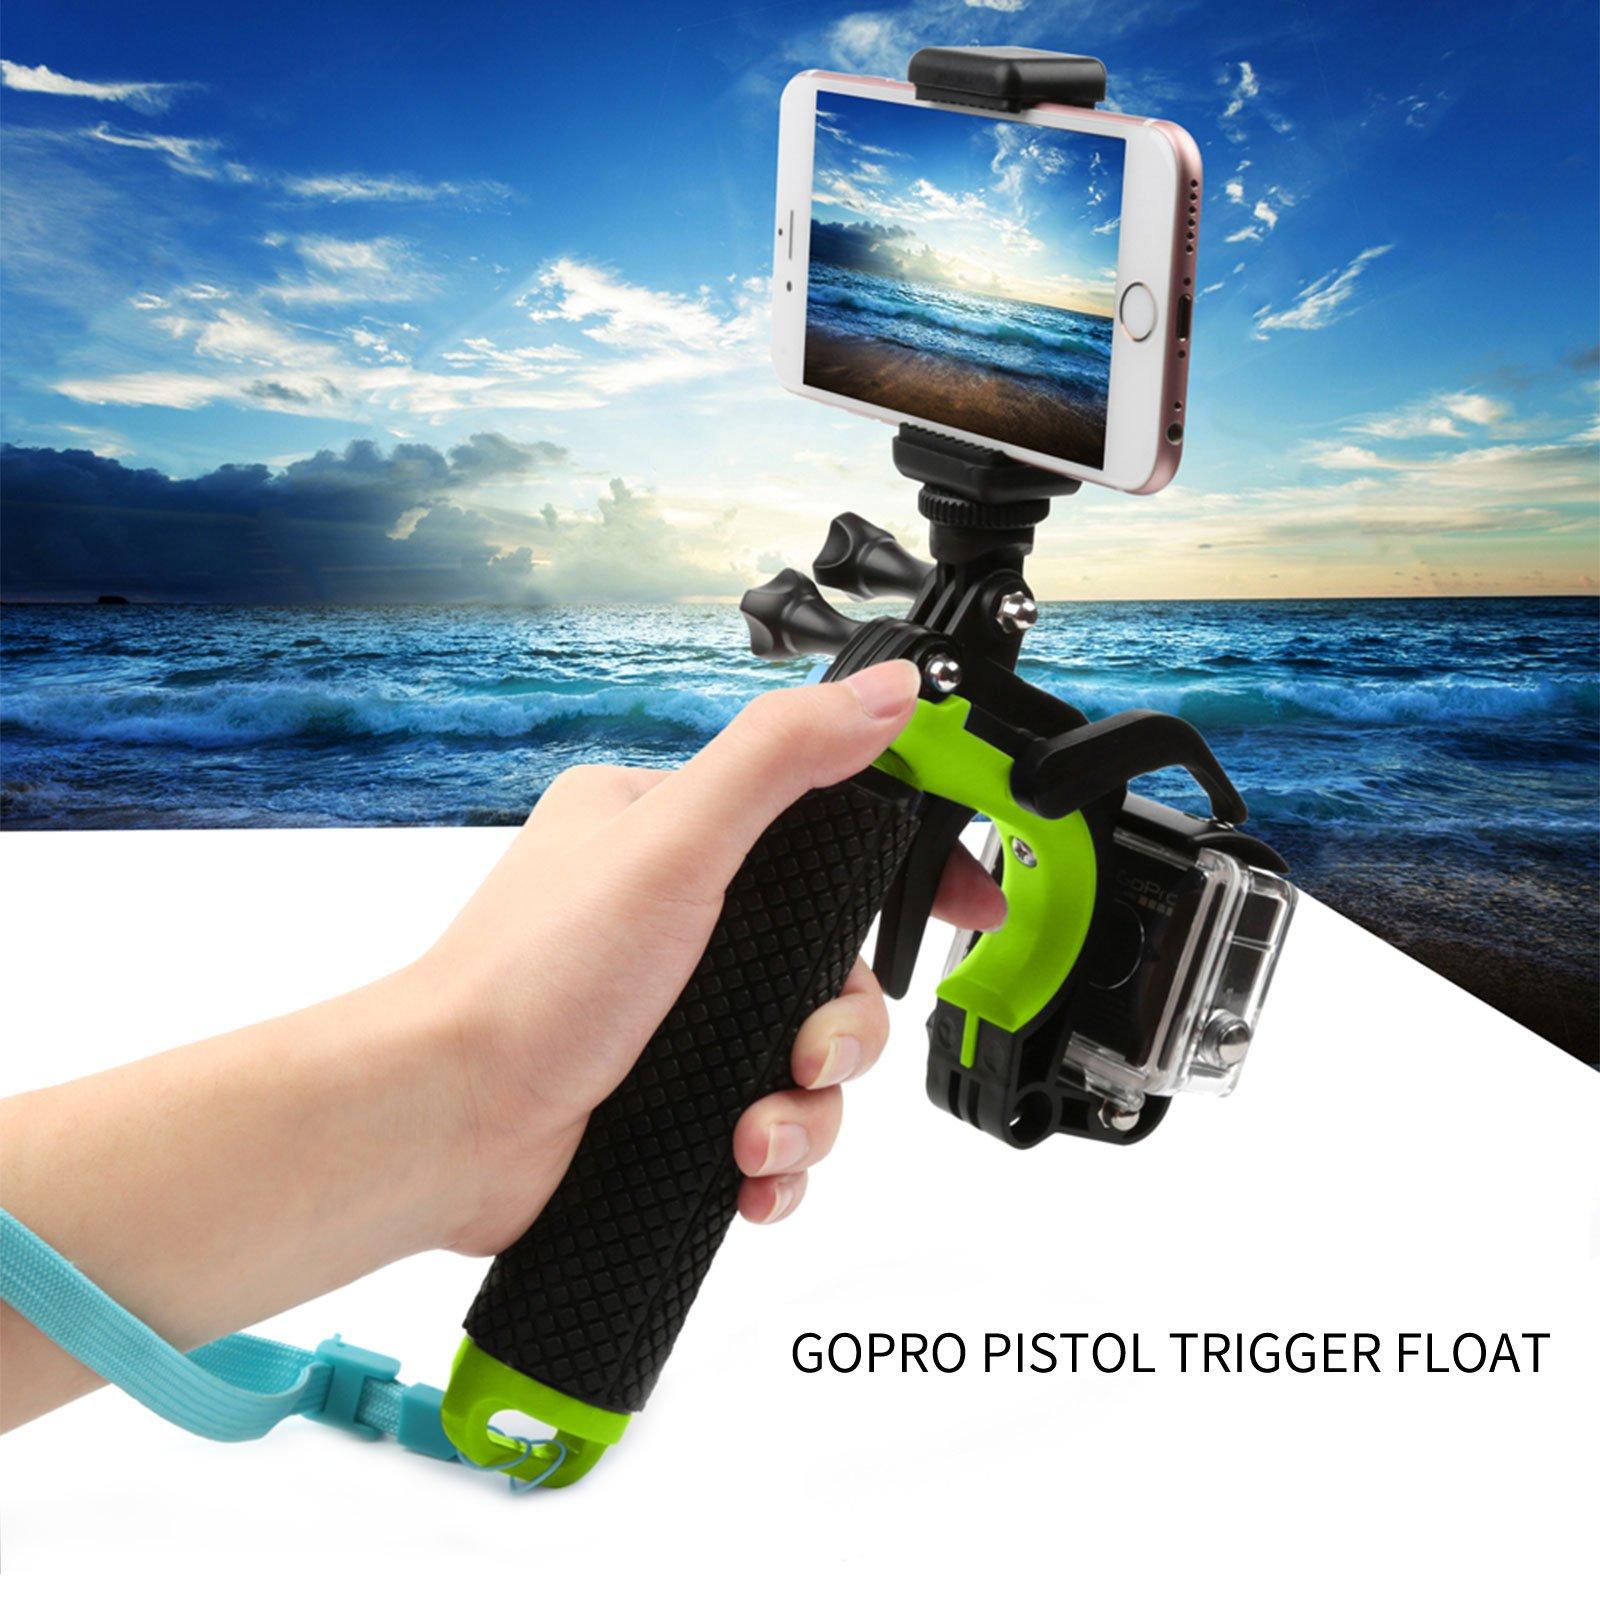 ARCHE GoPro Waterproof Pistol Shutter Trigger Kit for Gopro Hero 6 Black, Gopro Hero 5, Hero 4,Hero 3+ Hero 3, Hero+LCD Yi Action SJCAM Xiaomi (Blue/Green/Orange/Pink/Yellow) (Green)